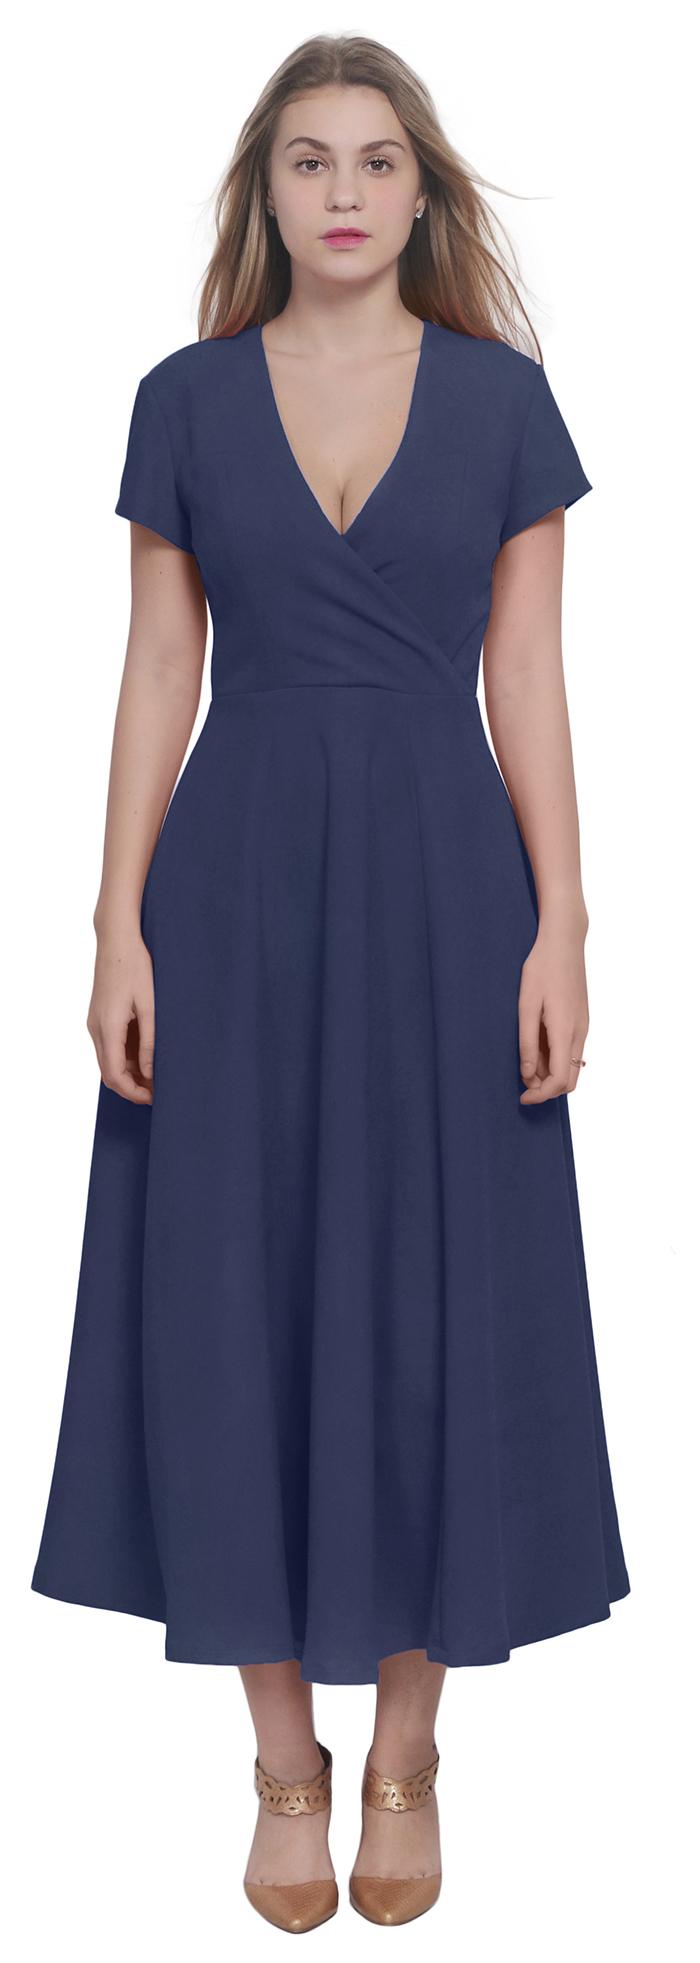 Midi Dresses | Midi Dress Styles Online | Topshop